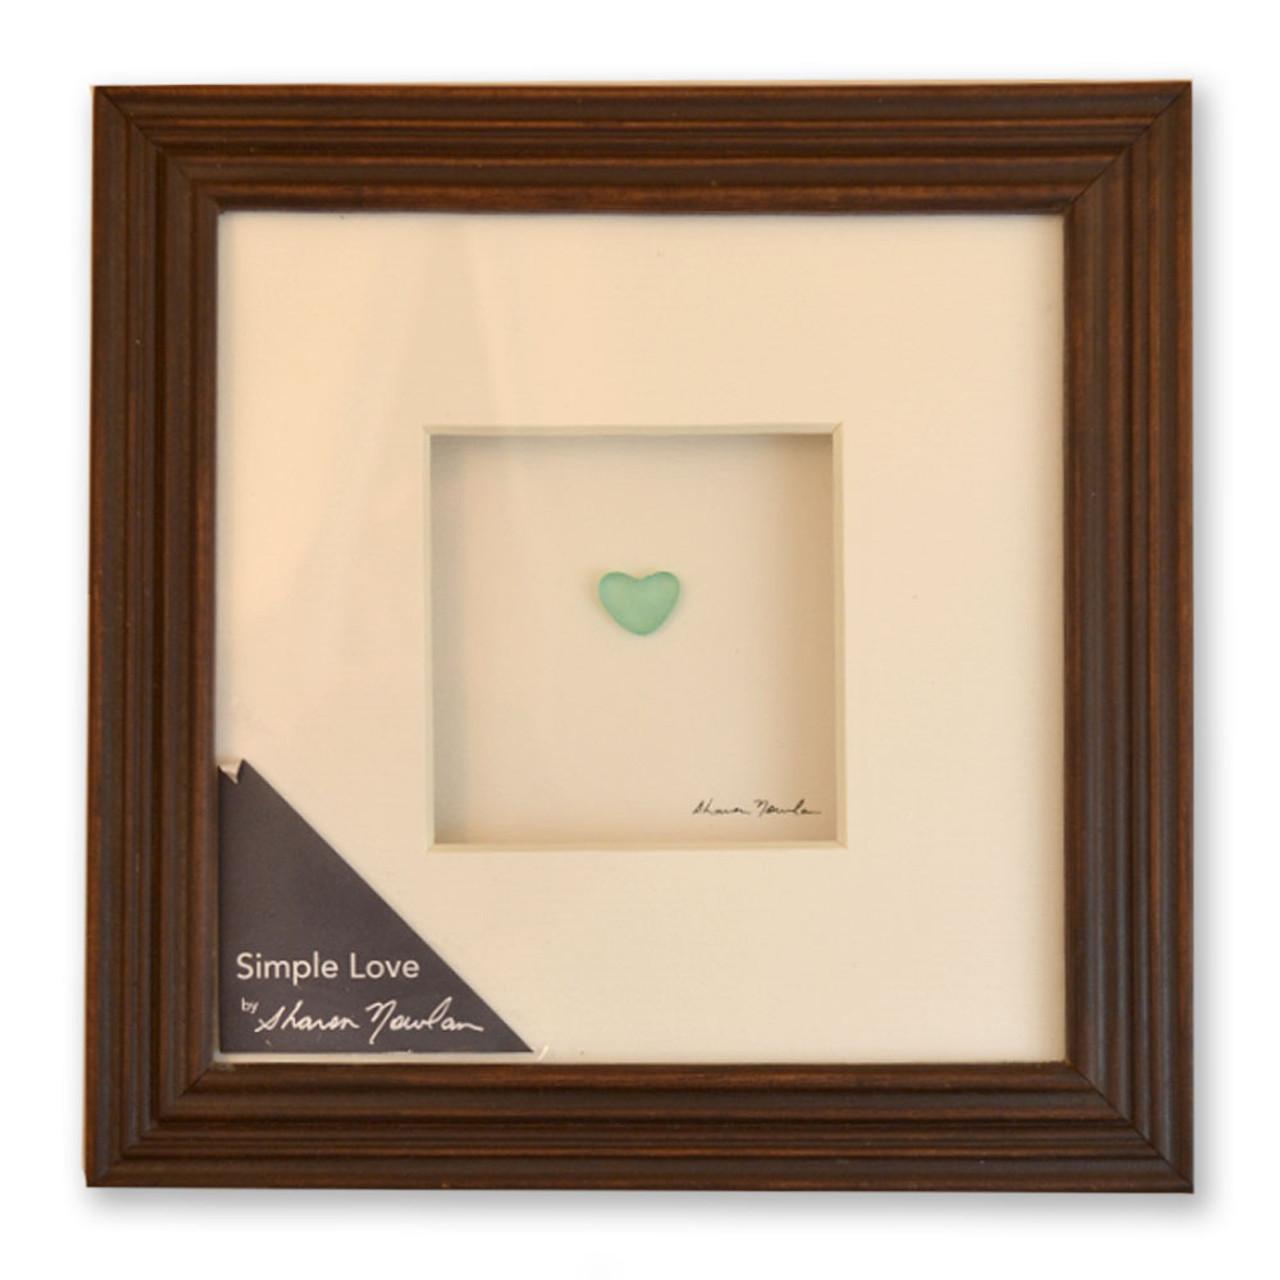 Simple Love Wall Art